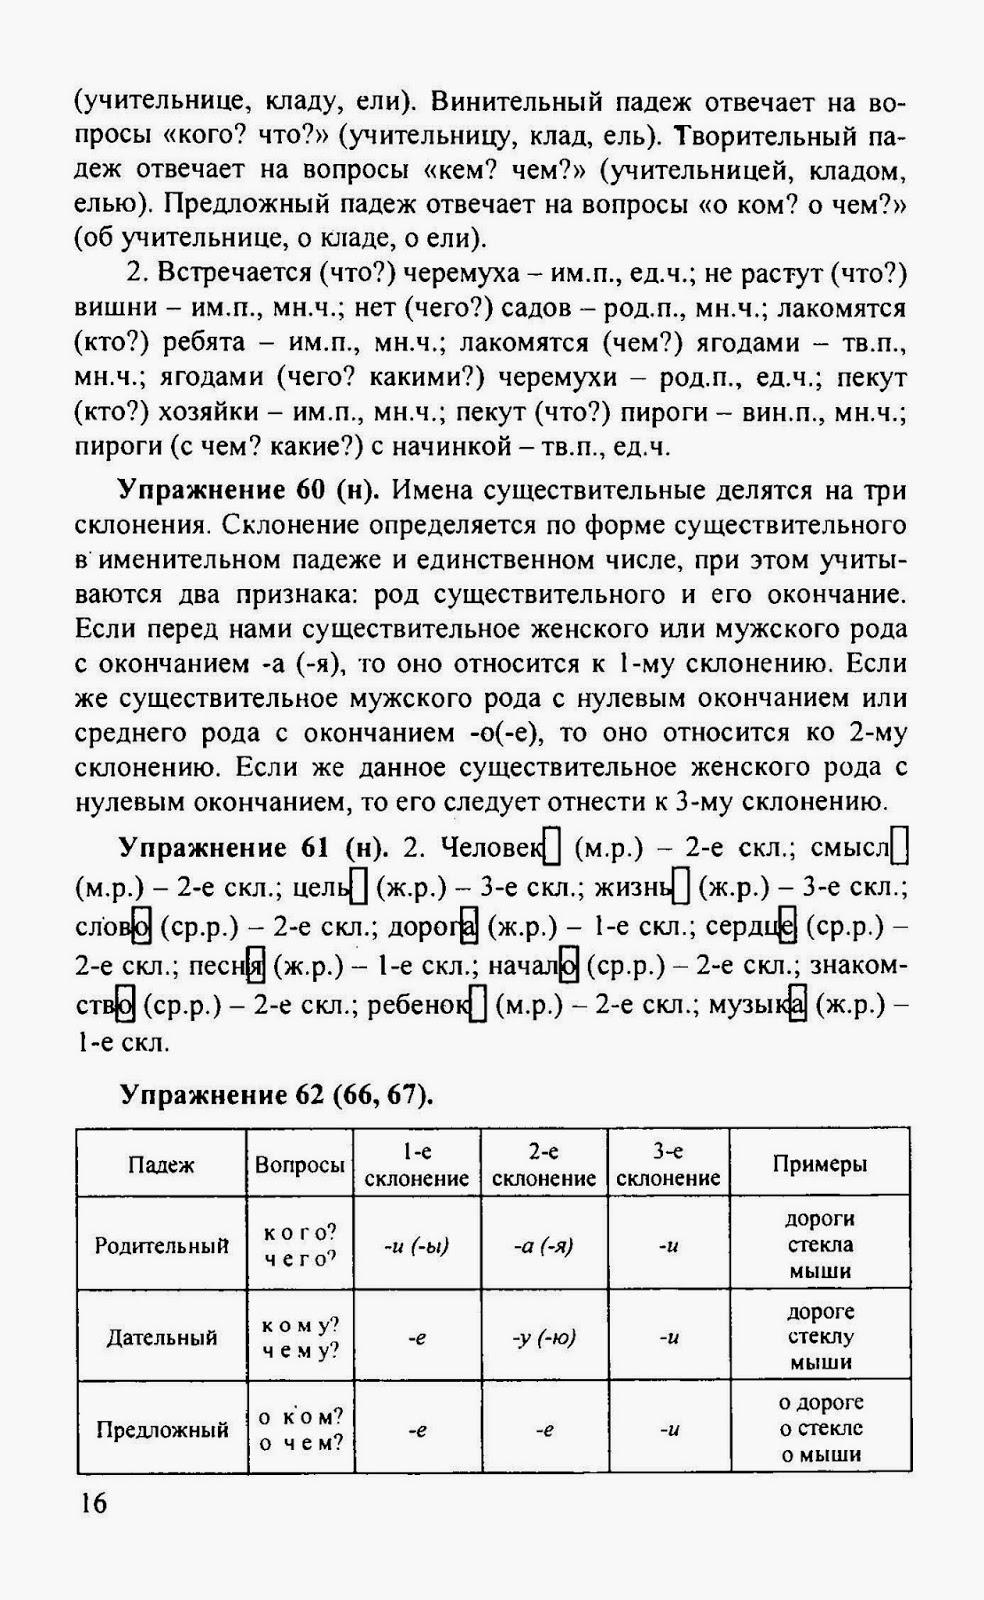 Решебник по русскому языку Купалова Еремеева Лидман-орлова Практика